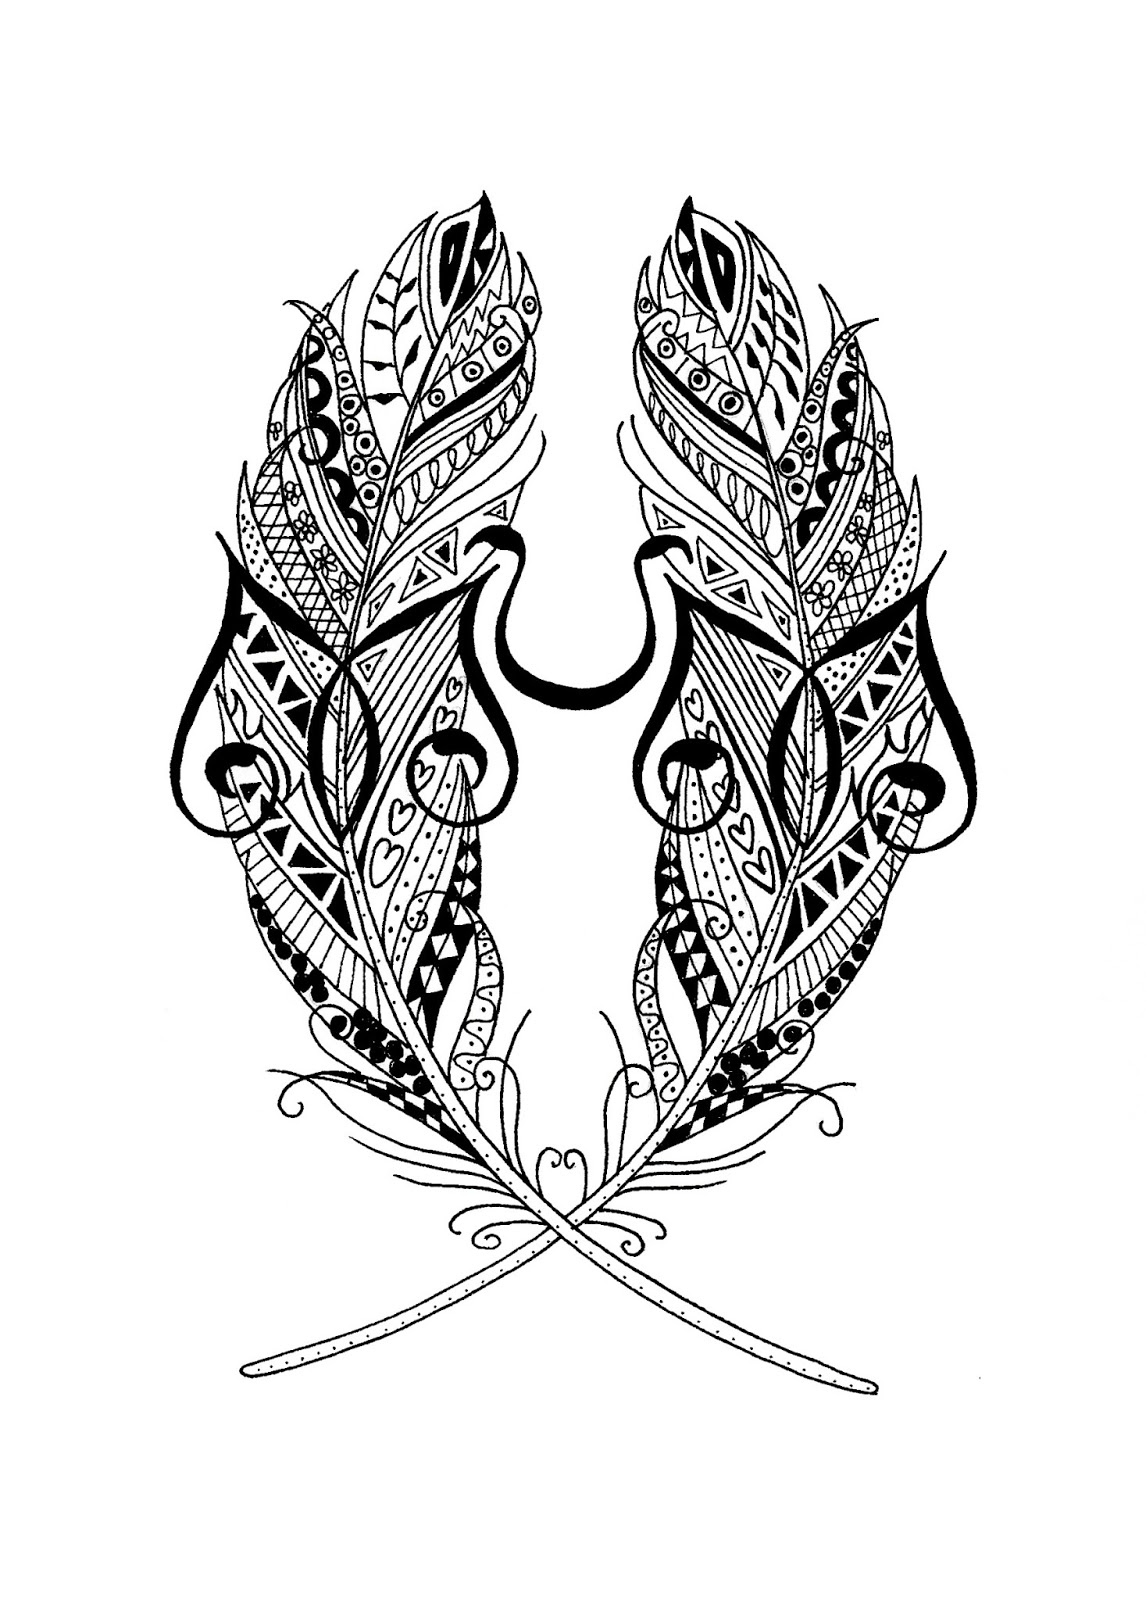 kathryn hockey oca learning log exercise tattoo. Black Bedroom Furniture Sets. Home Design Ideas